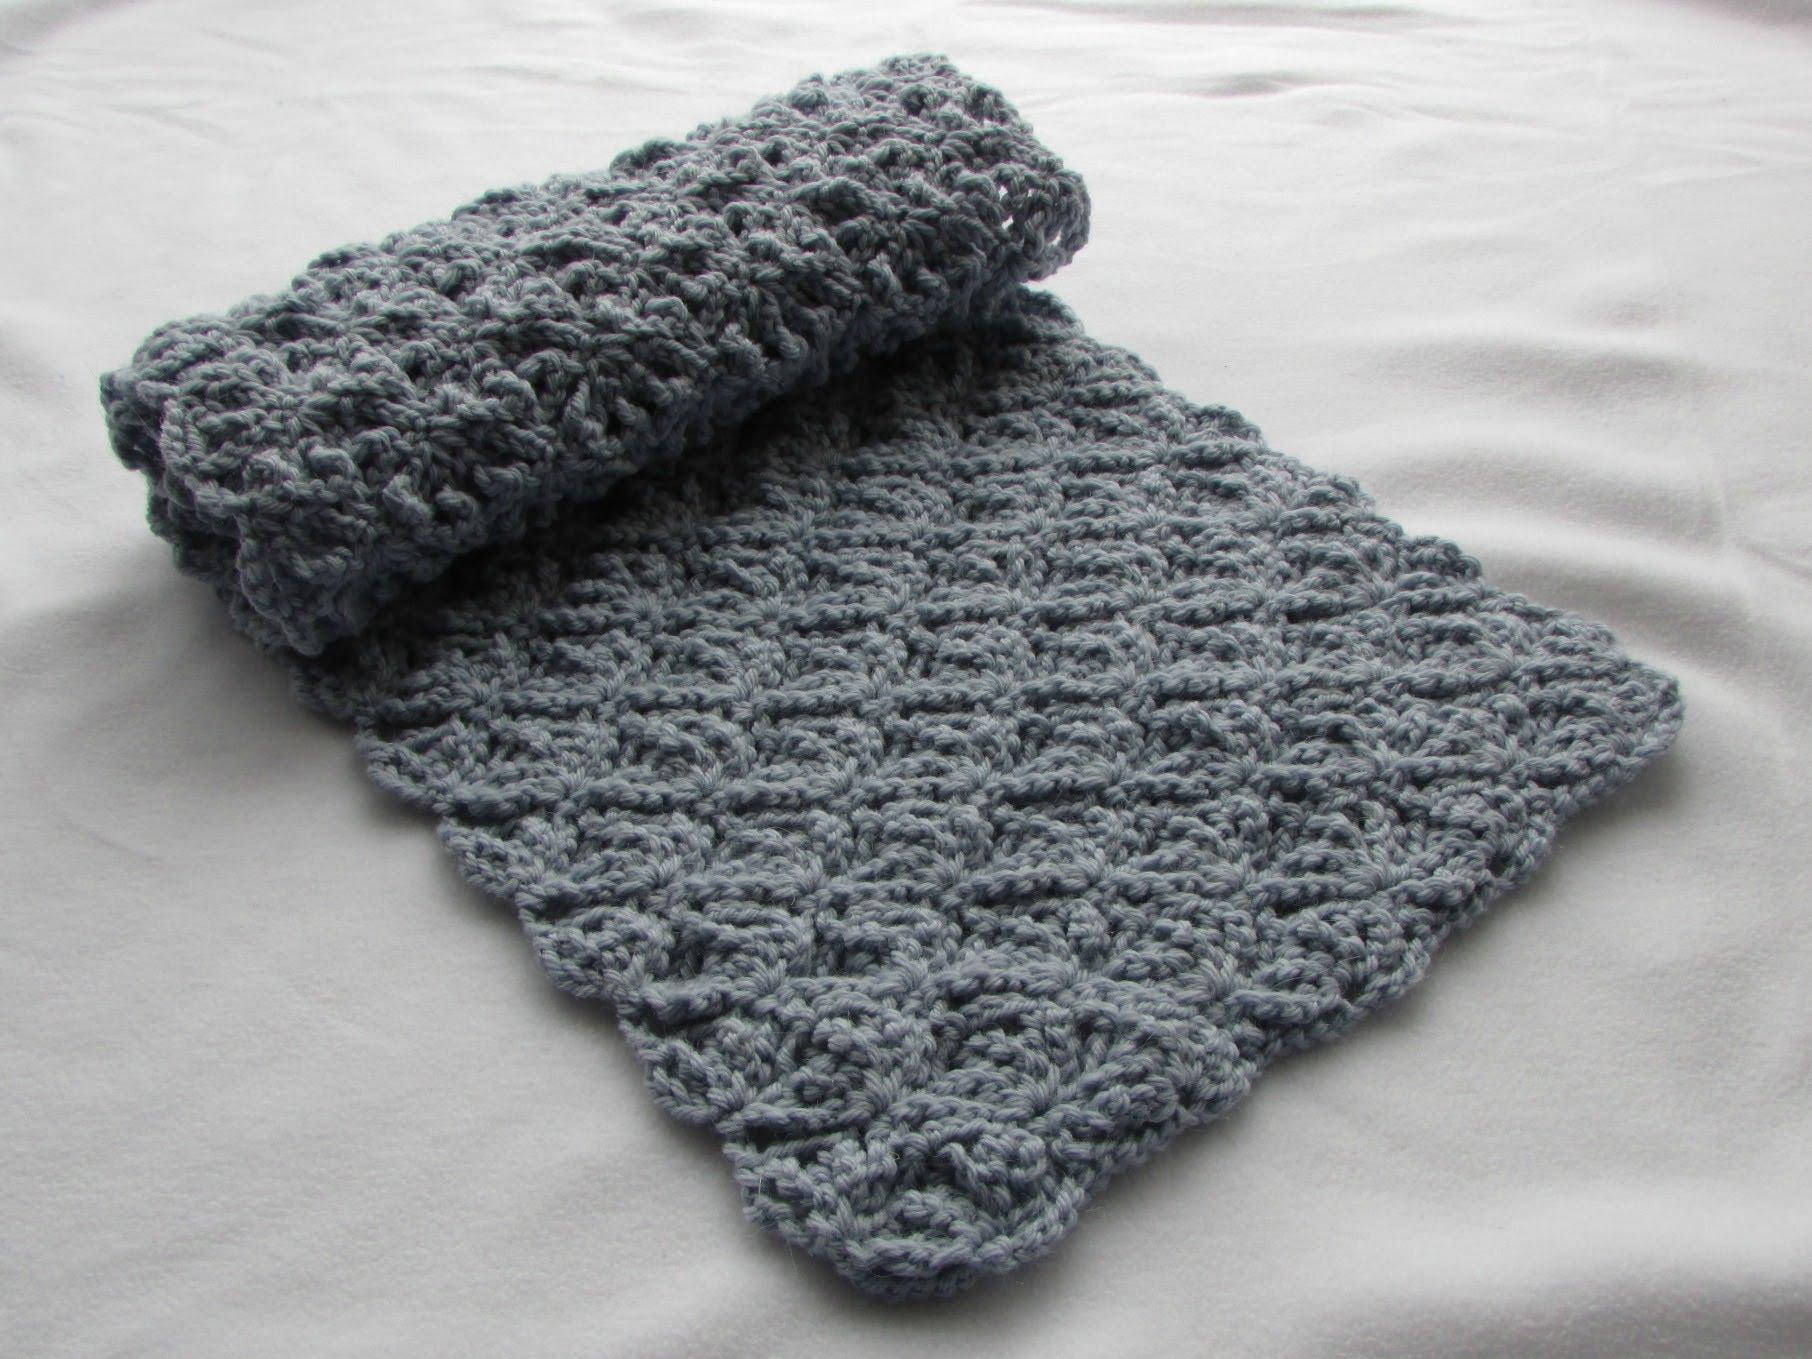 crochet scarf easy crochet pretty lace scarf tutorial - part 1 - youtube eqafvuc